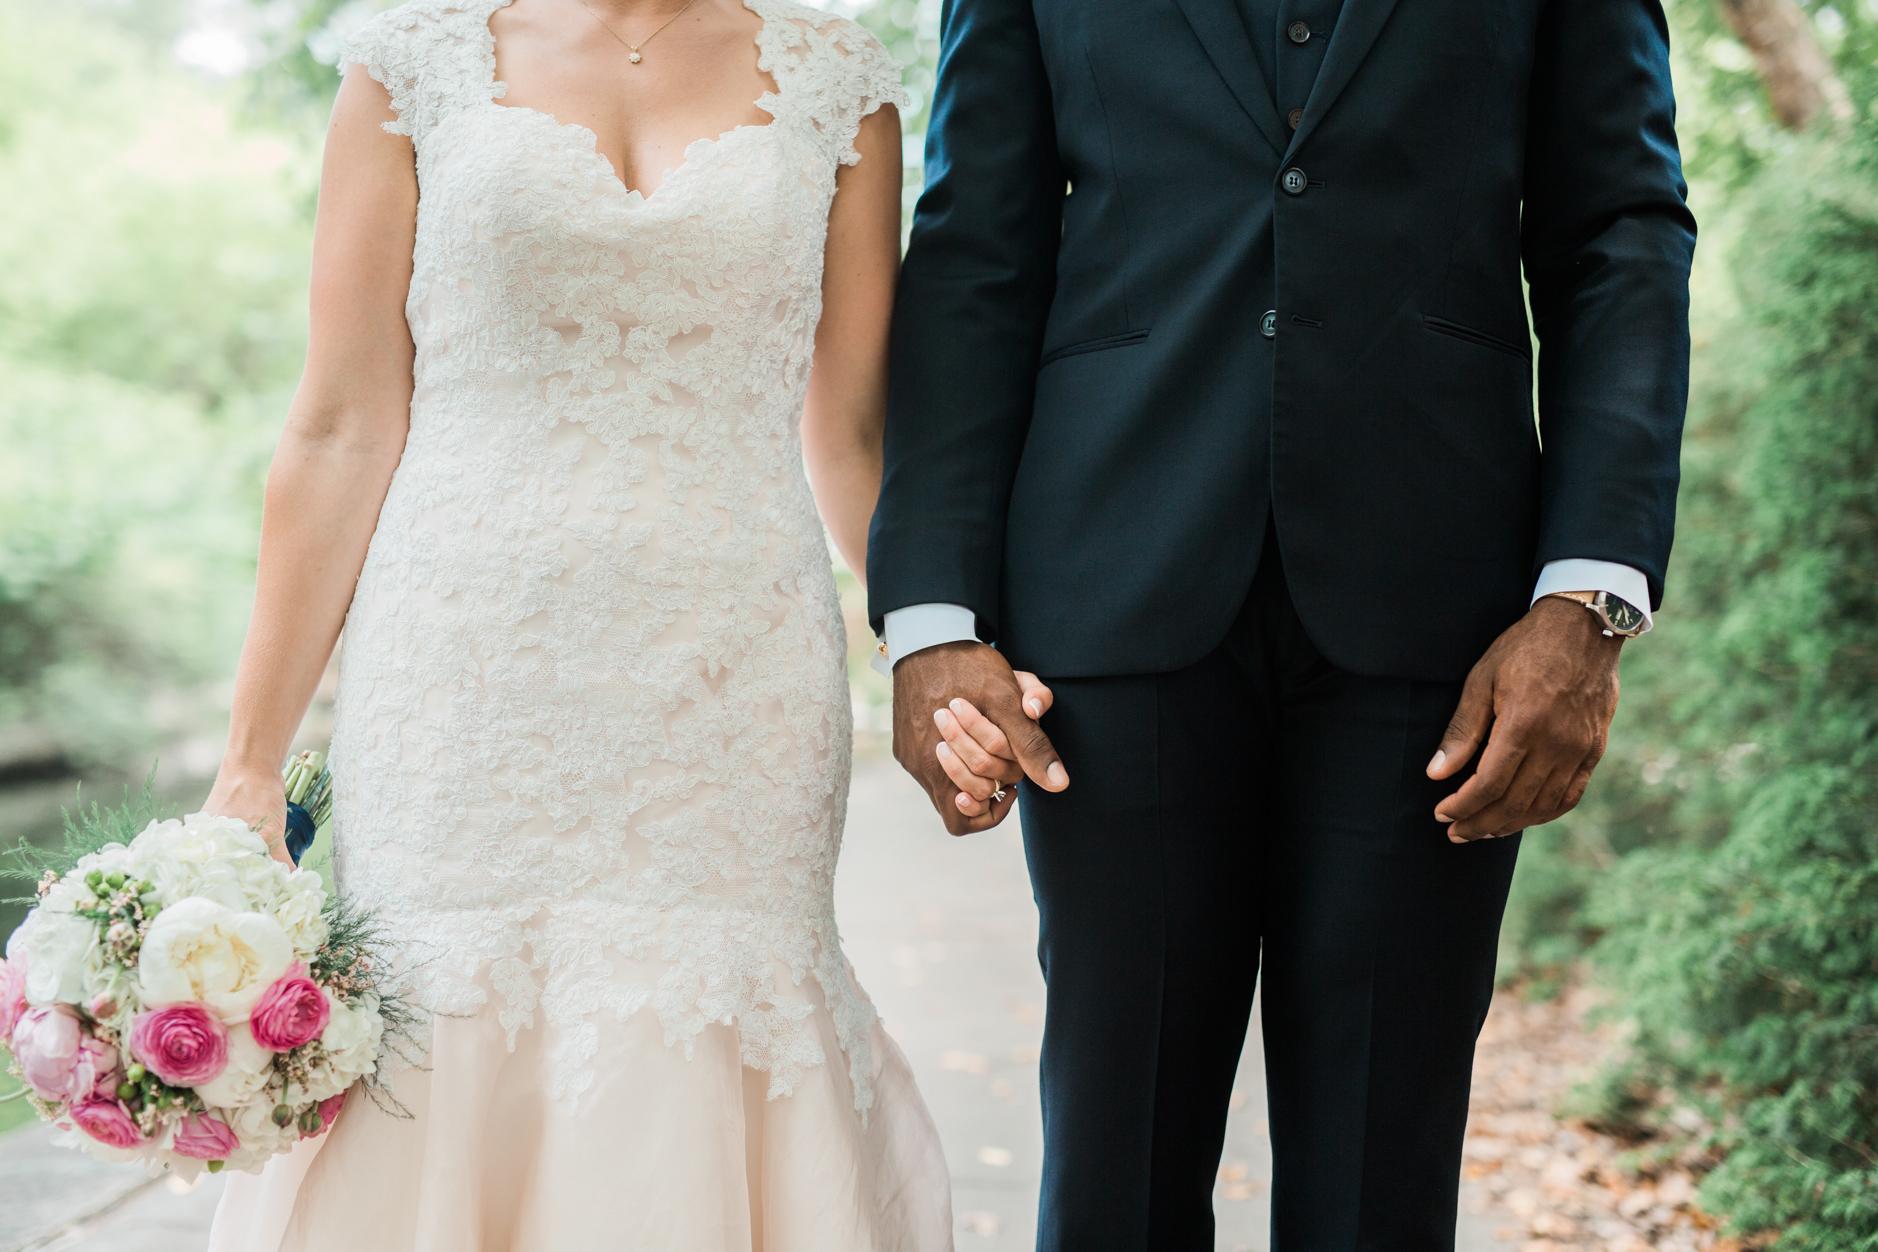 LegacyUnion-Wedding-Photographer-Glendale-CA-40.jpg